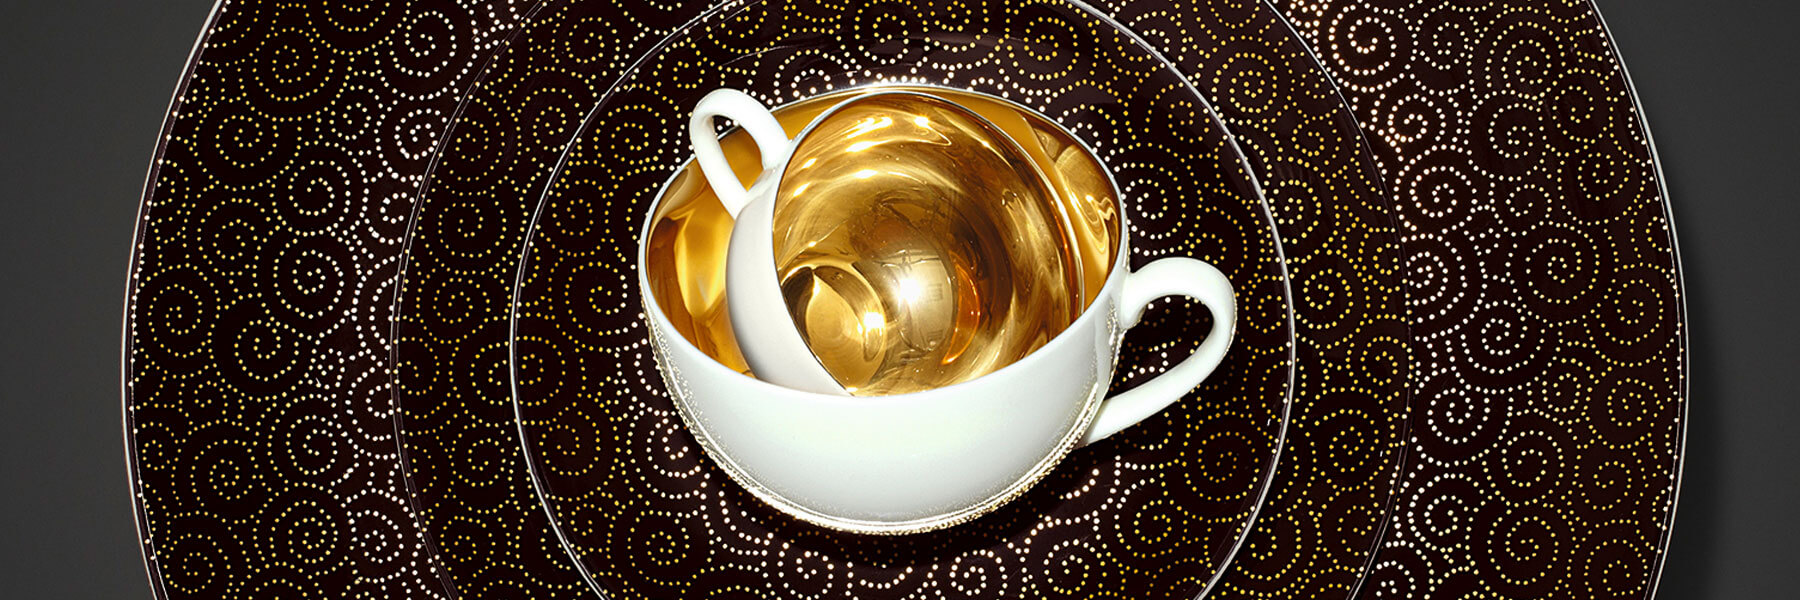 Specht & Sohn für Dibbert - Ornament Gold-Schwarz